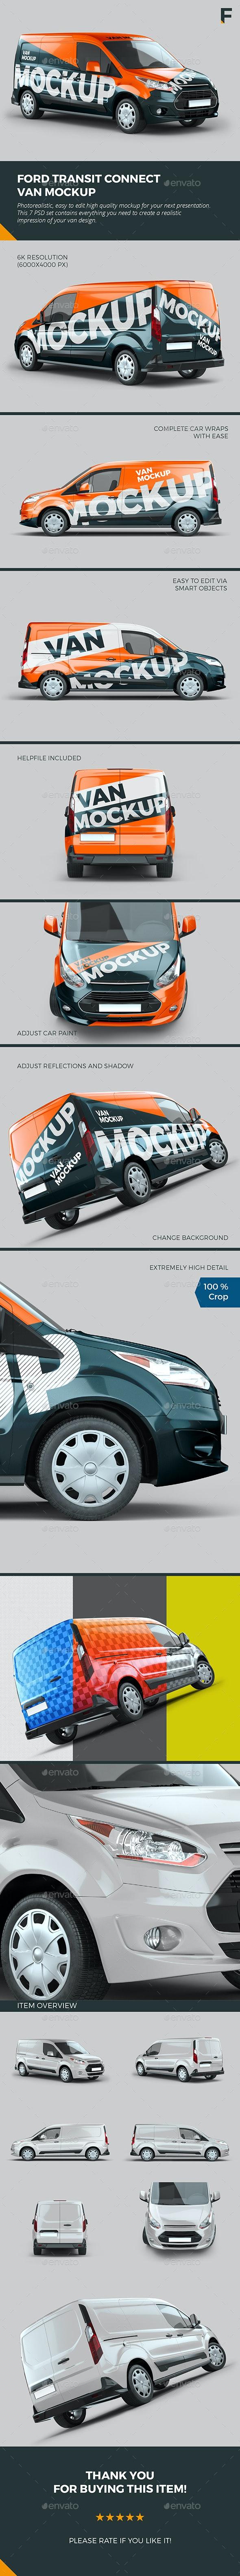 Ford Transit Connect Van Mock up - Vehicle Wraps Print